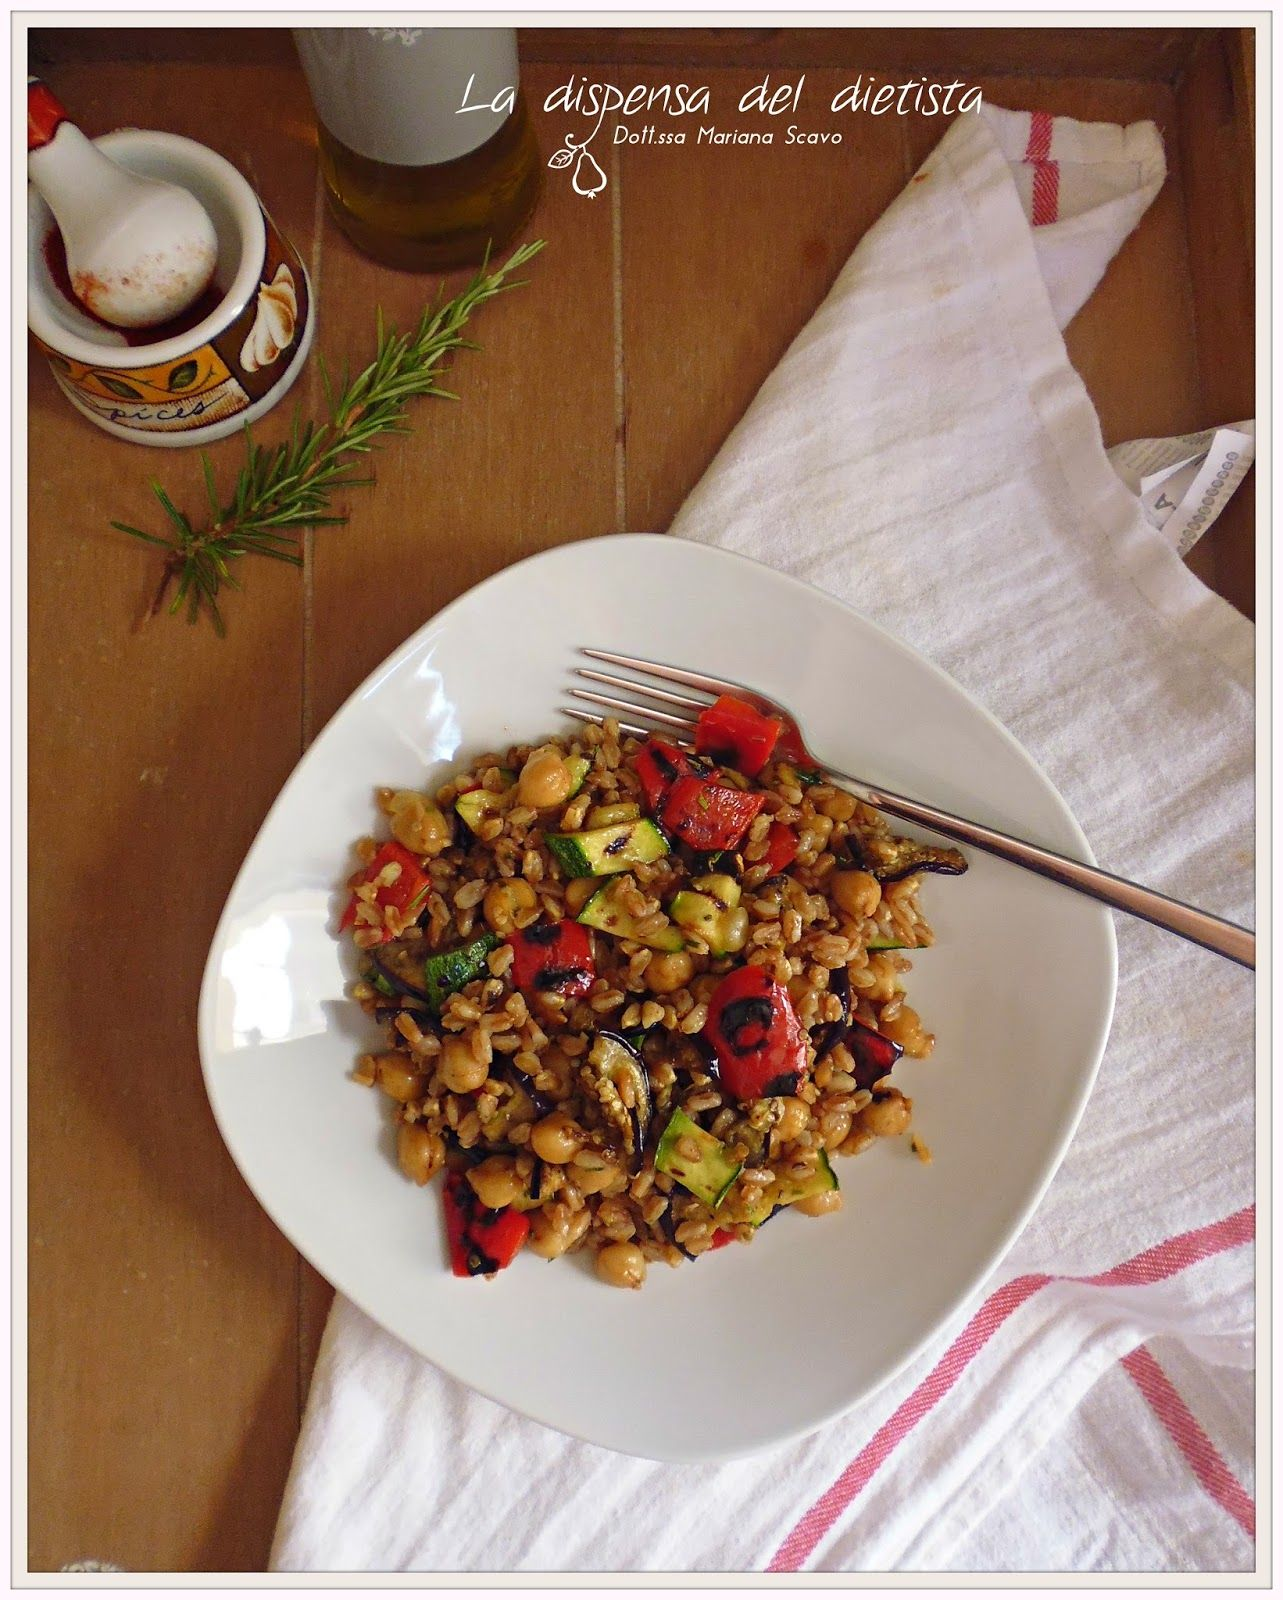 Cucina vegetariana ricette blog home ricette segreti - Cucina vegetariana ricette ...